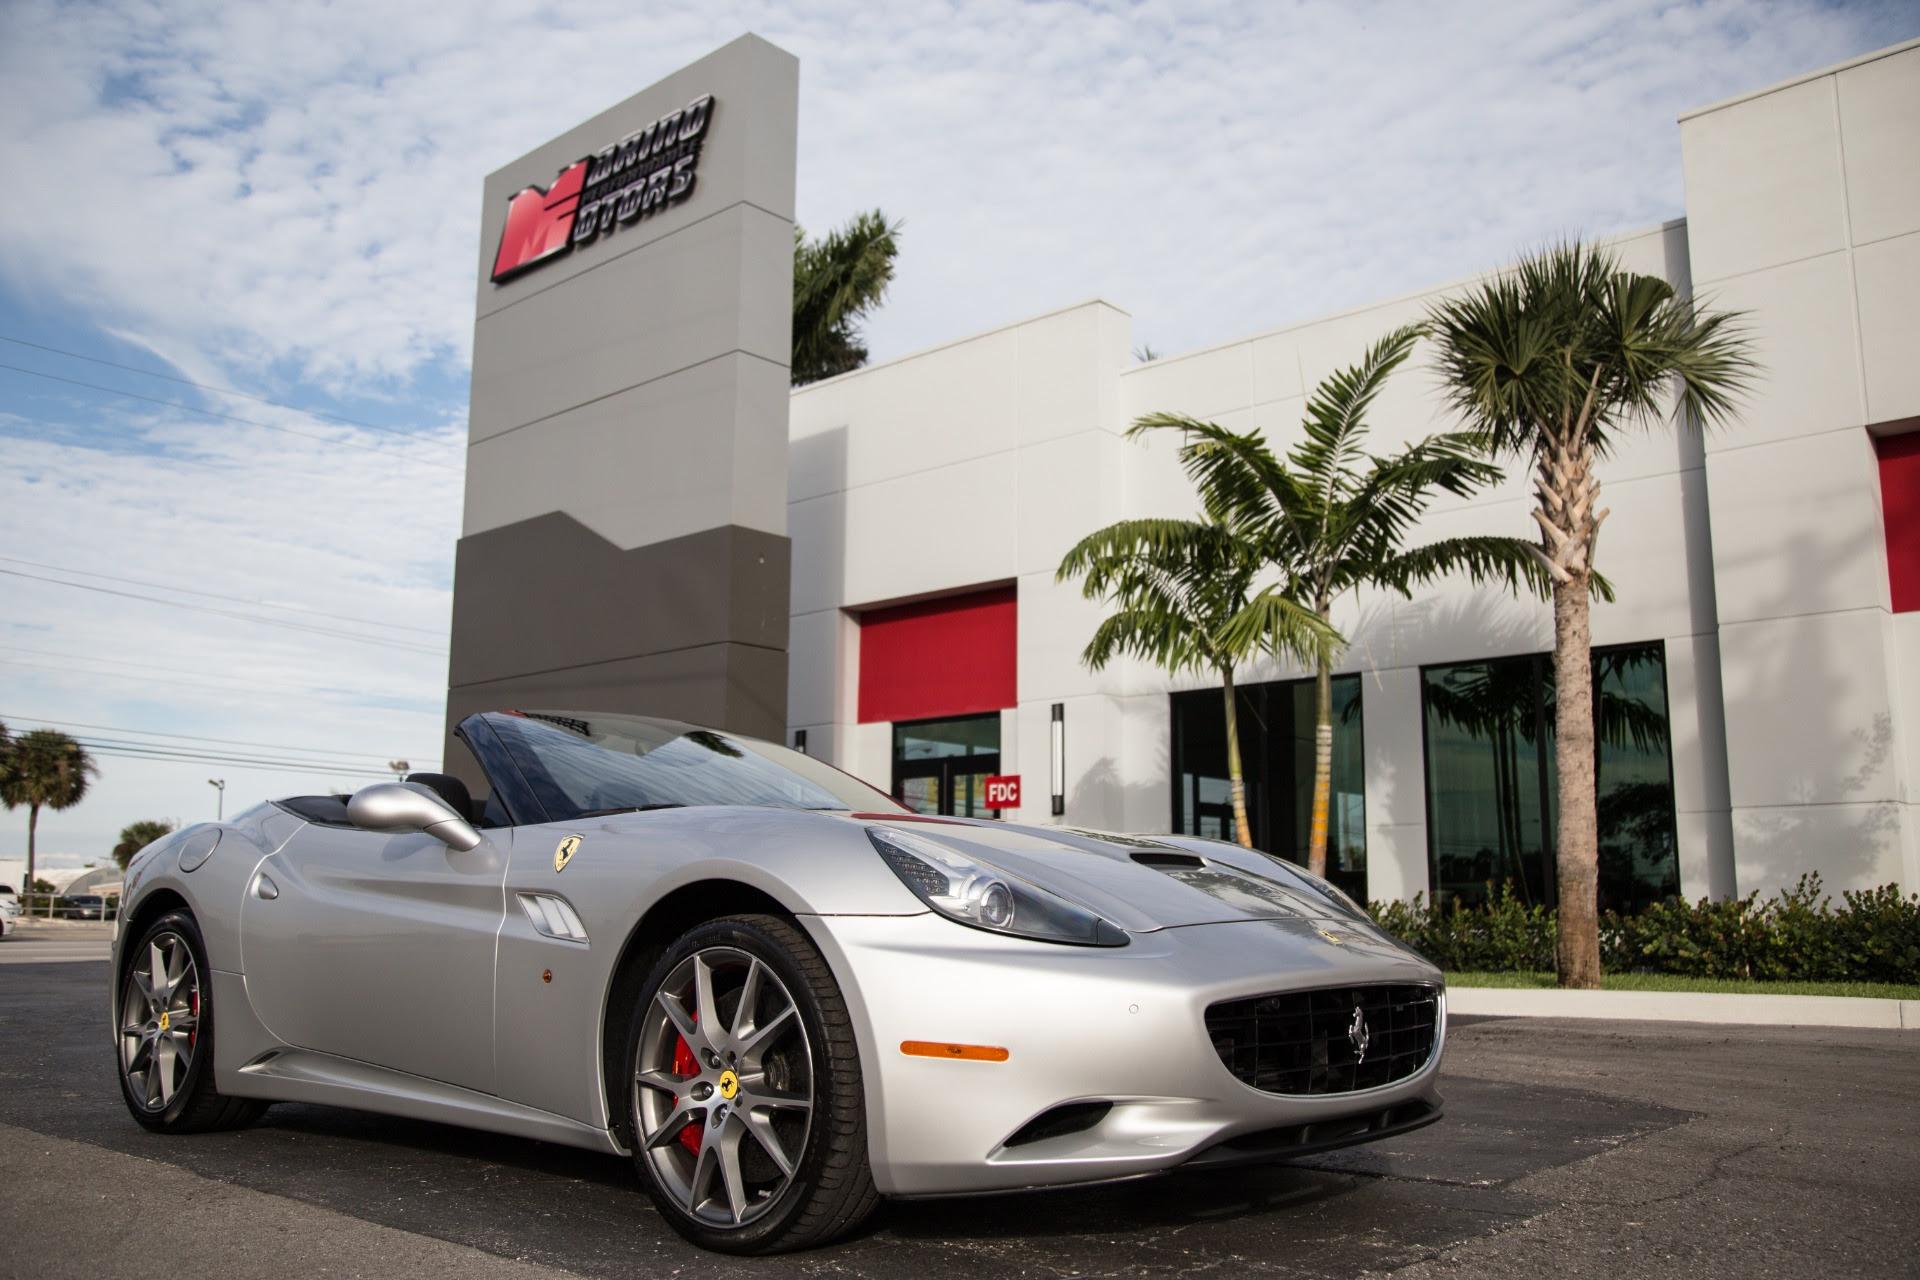 Used 2010 Ferrari California For Sale ($99,900) | Marino ...